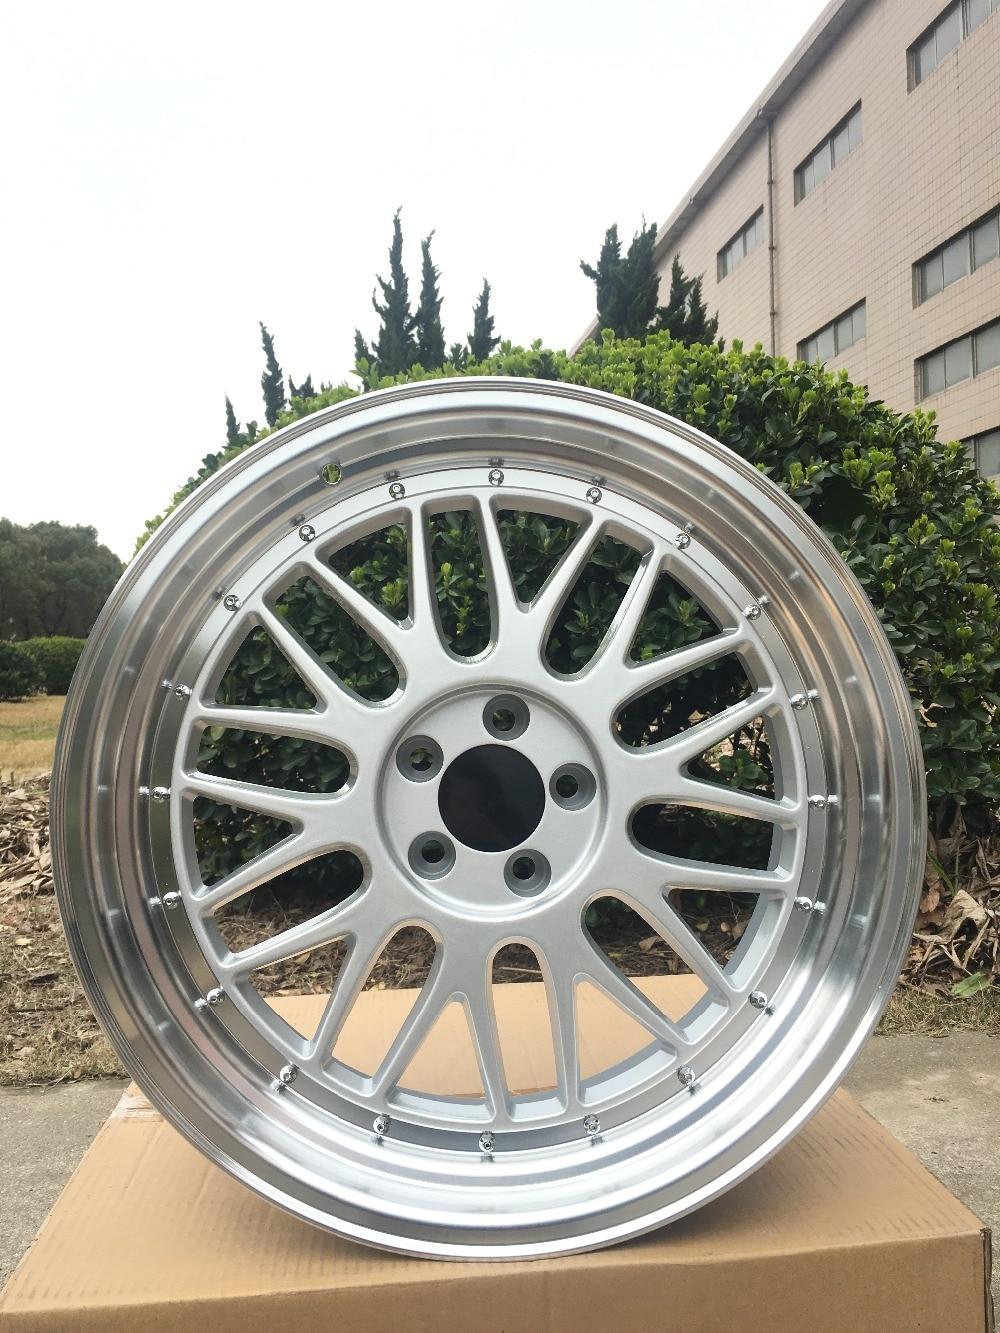 4 New 18x8 5Rims wheels ET 35mm CB 73 1mm Alloy Wheel Rims W882